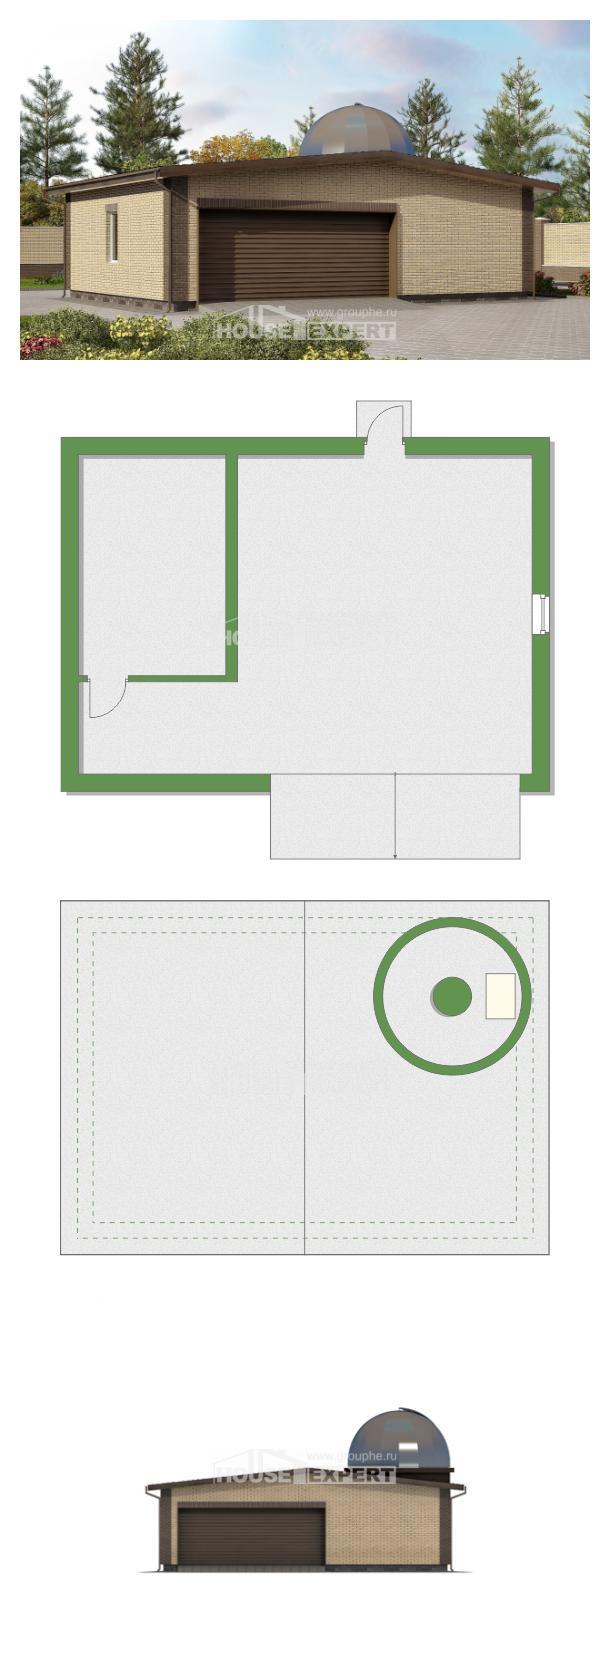 Проект дома 075-001-Л   House Expert